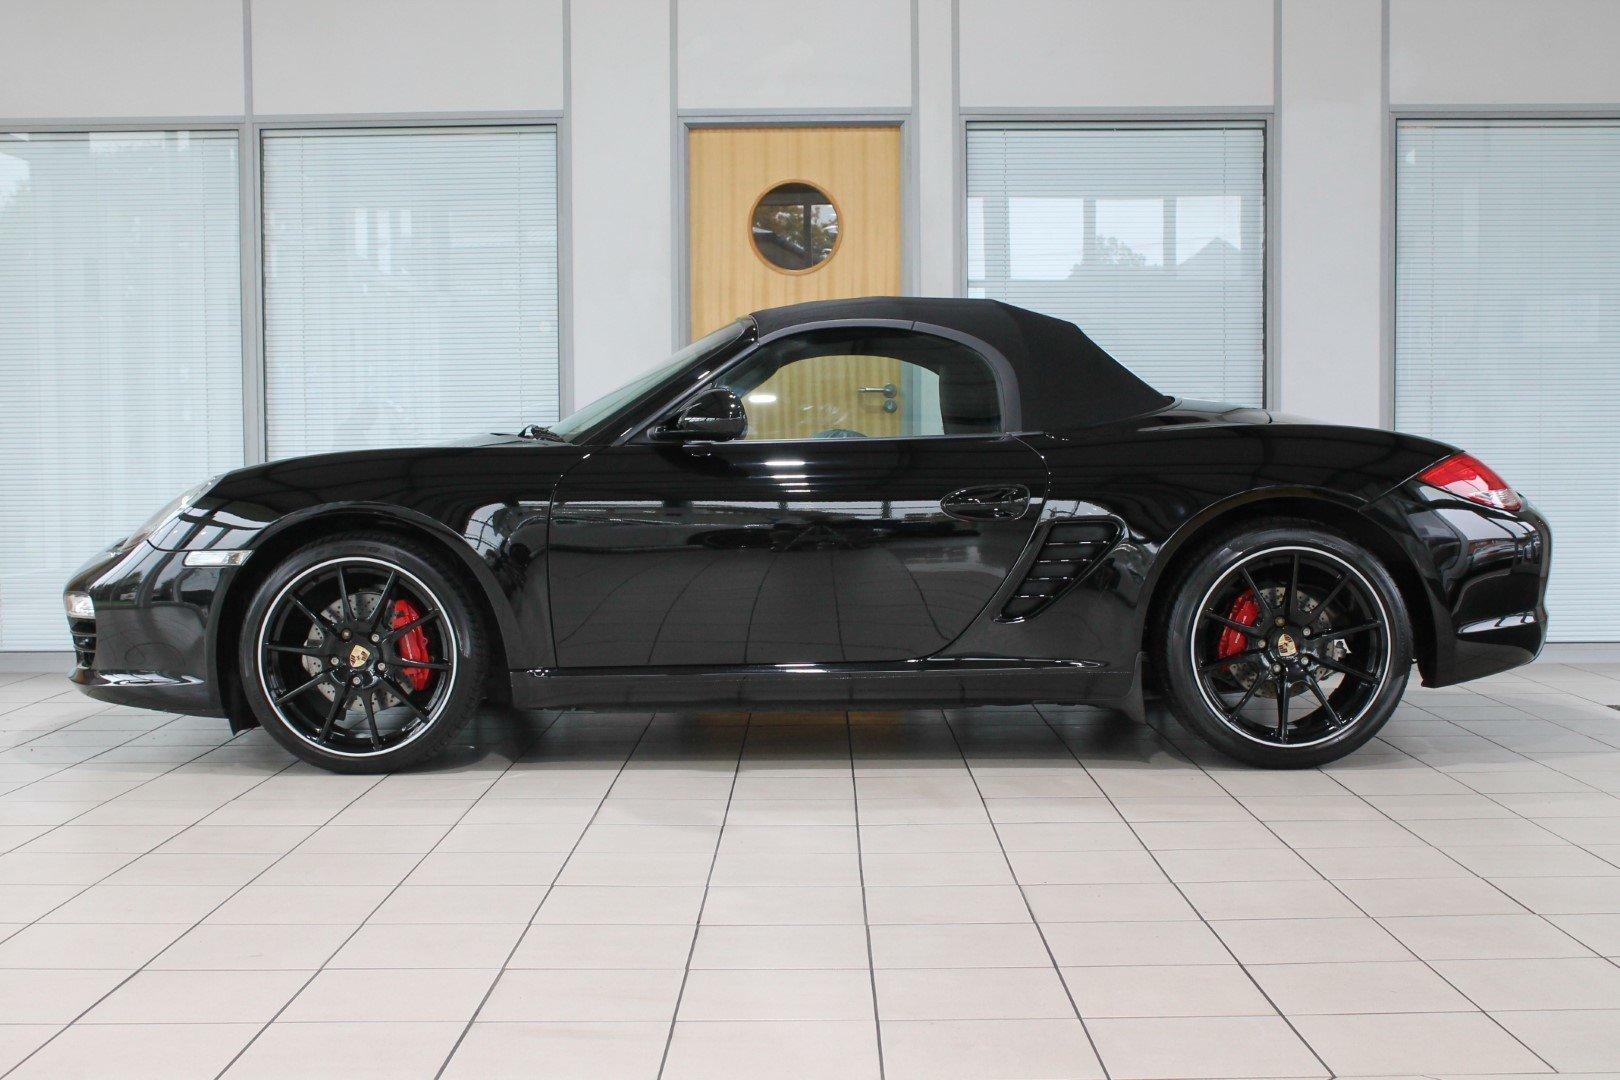 2011 Porsche Boxster (987) 3.4 S Black Edition Manual For Sale (picture 2 of 12)